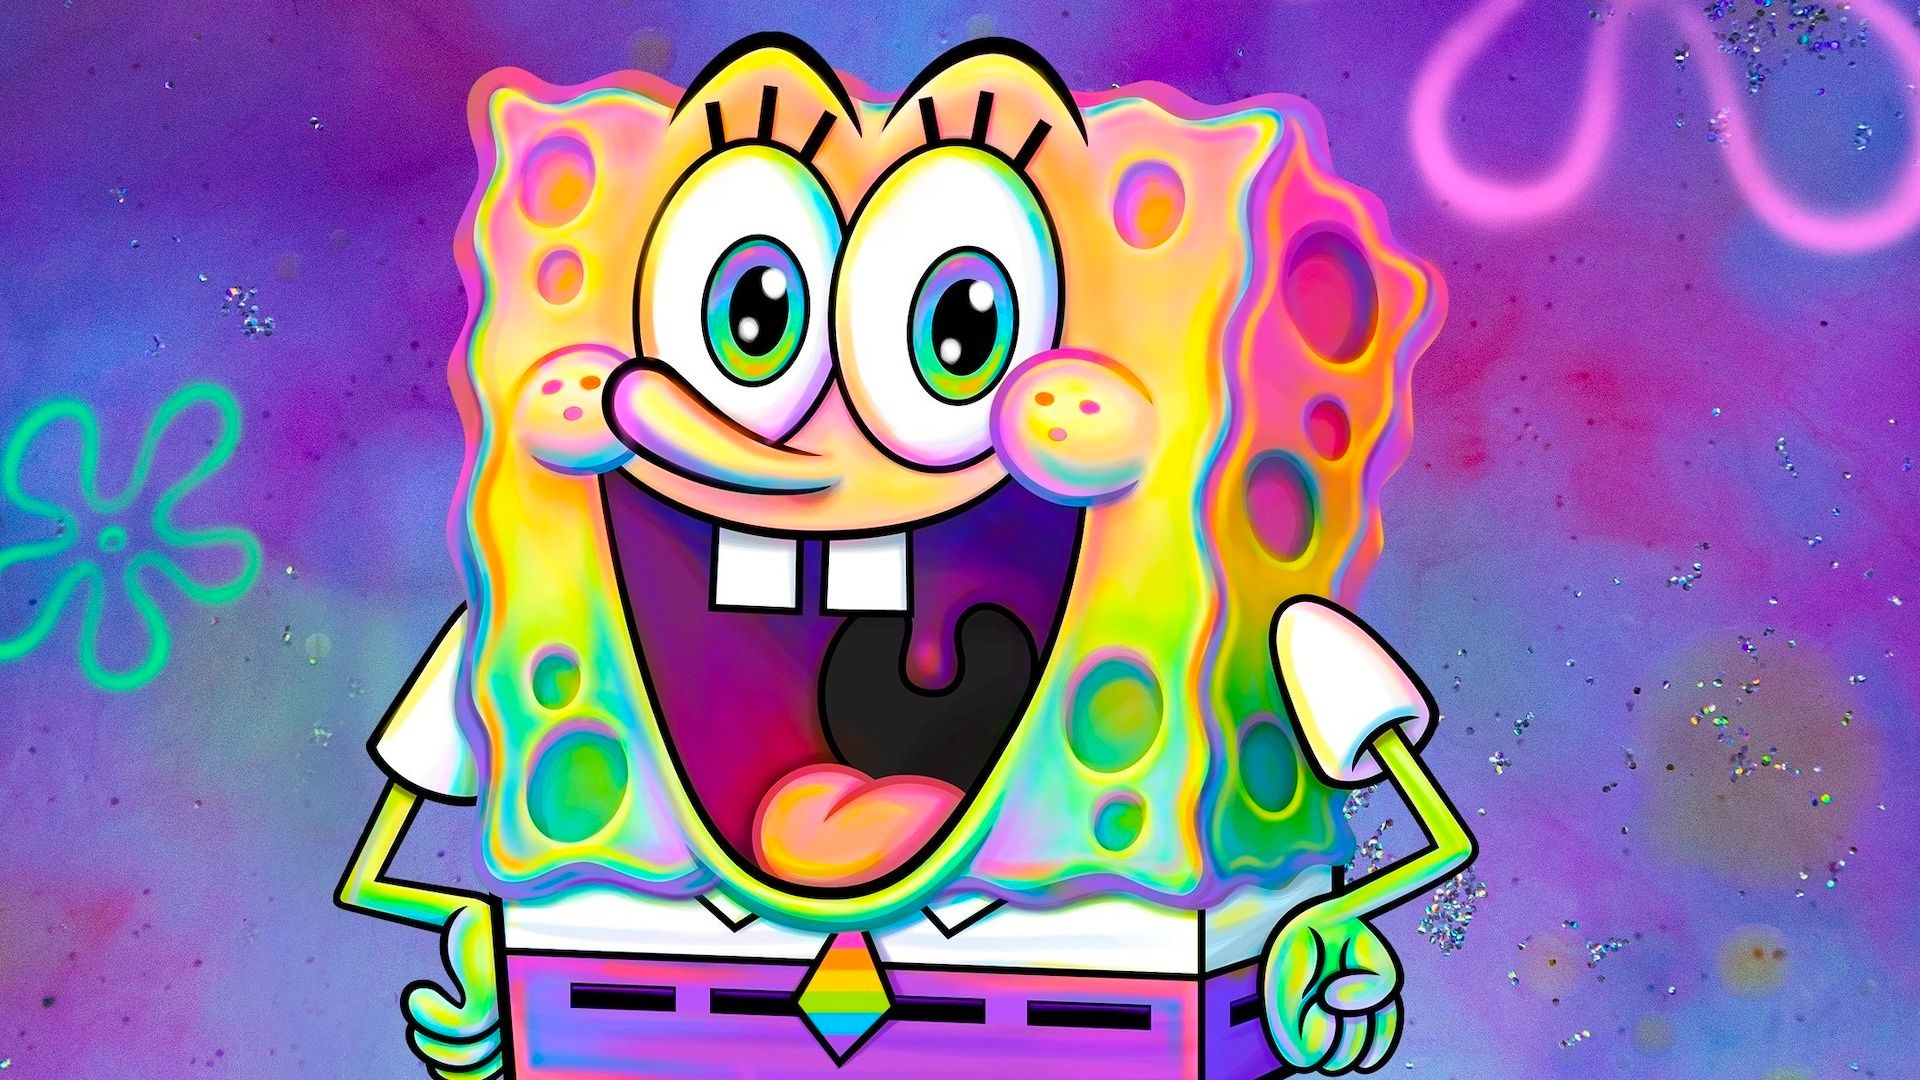 SpongeBob Isn't Gay, But He Can Still Be Part Of The LGBTQ+ Community